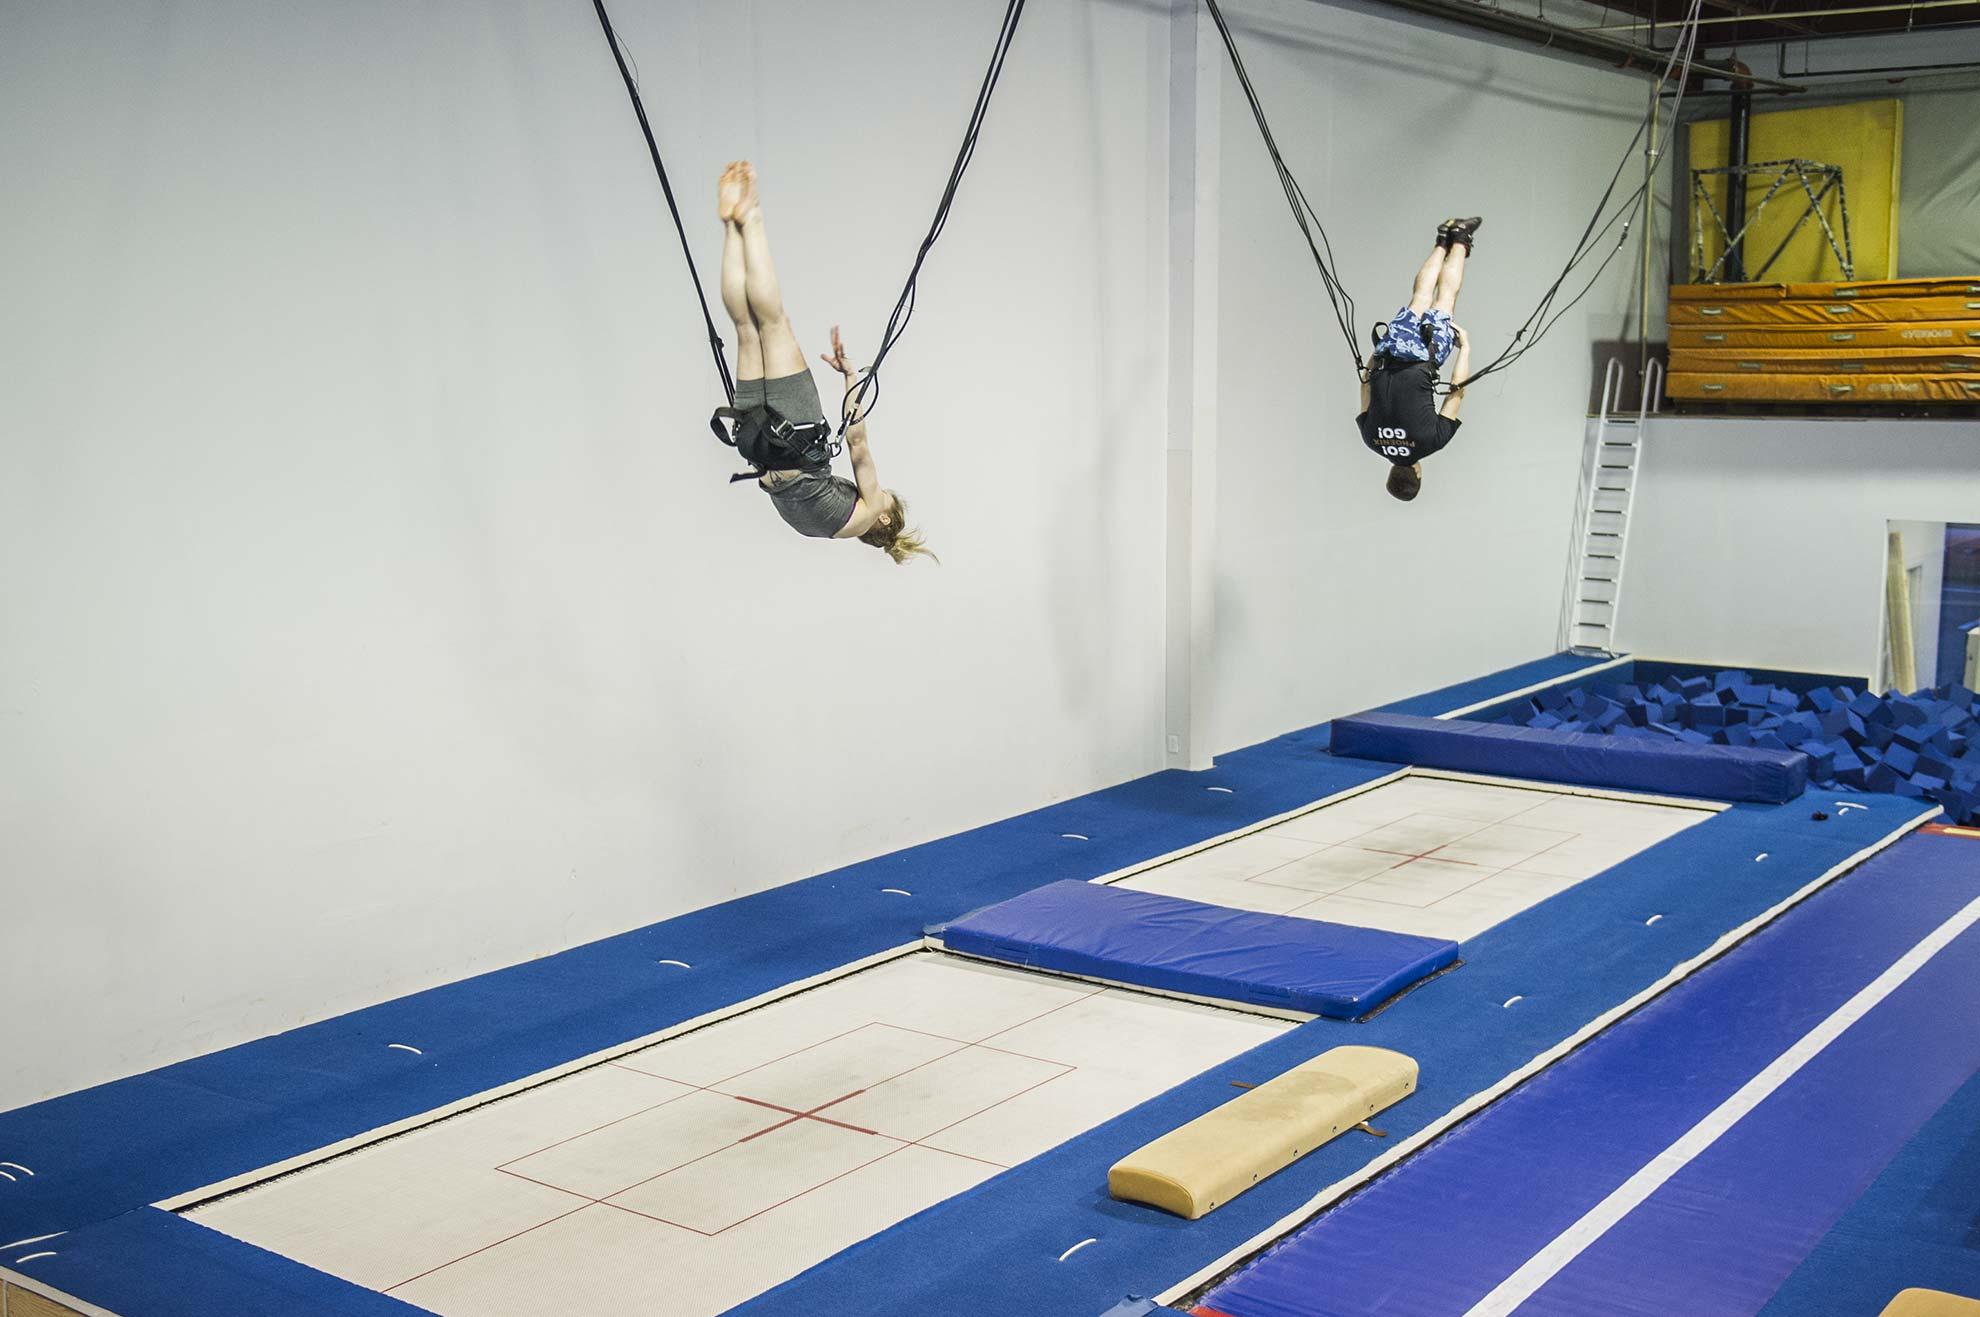 05-studiostudioacrobatique-trampoline-min